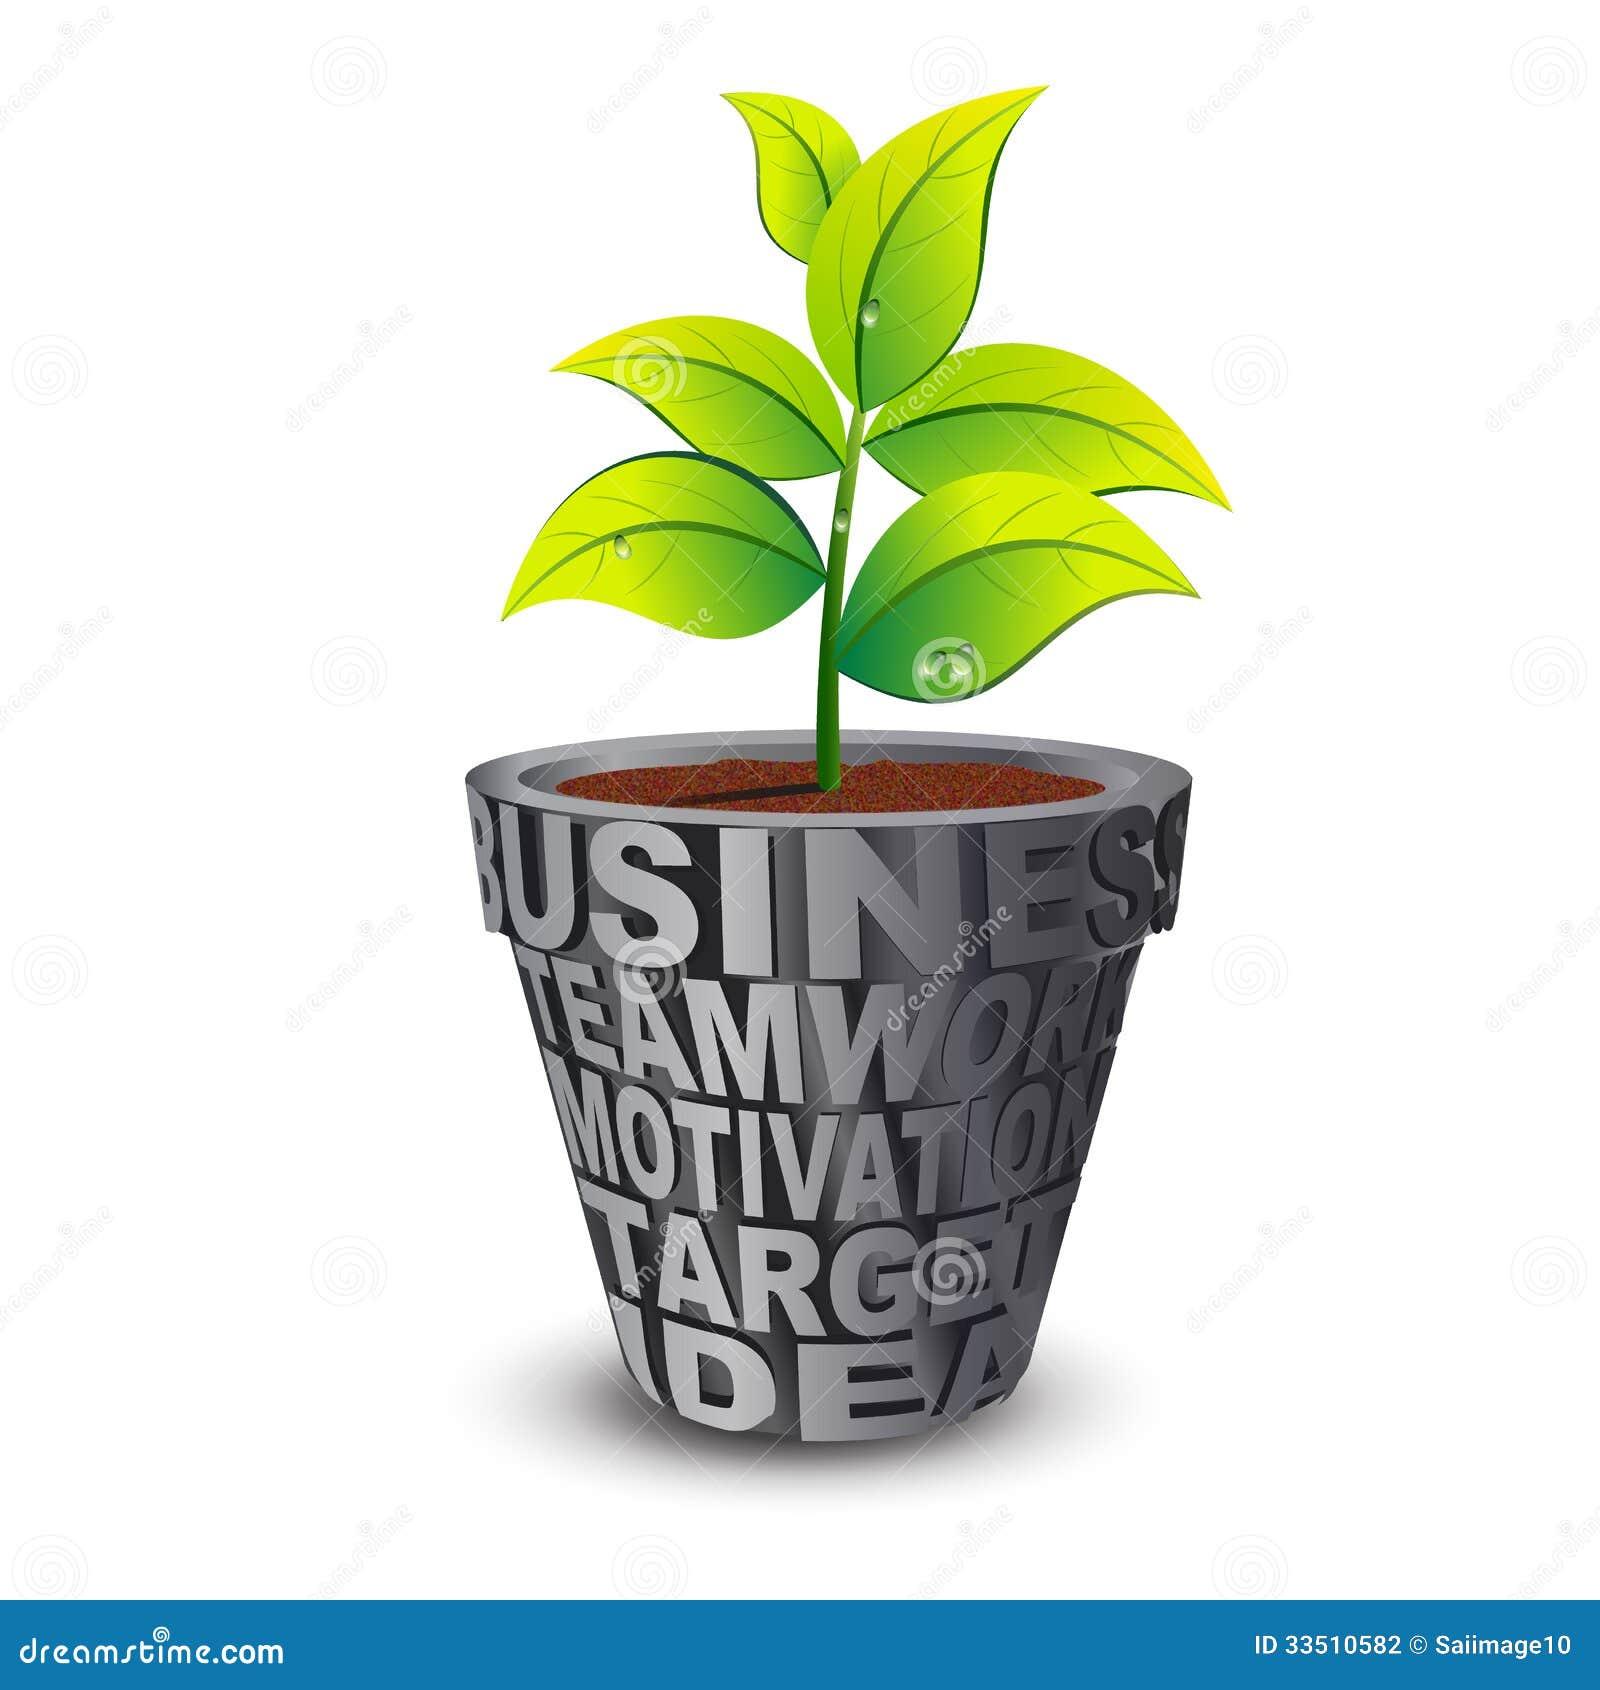 Business Growth Plant Stock Illustration Illustration Of Motivation 33510582